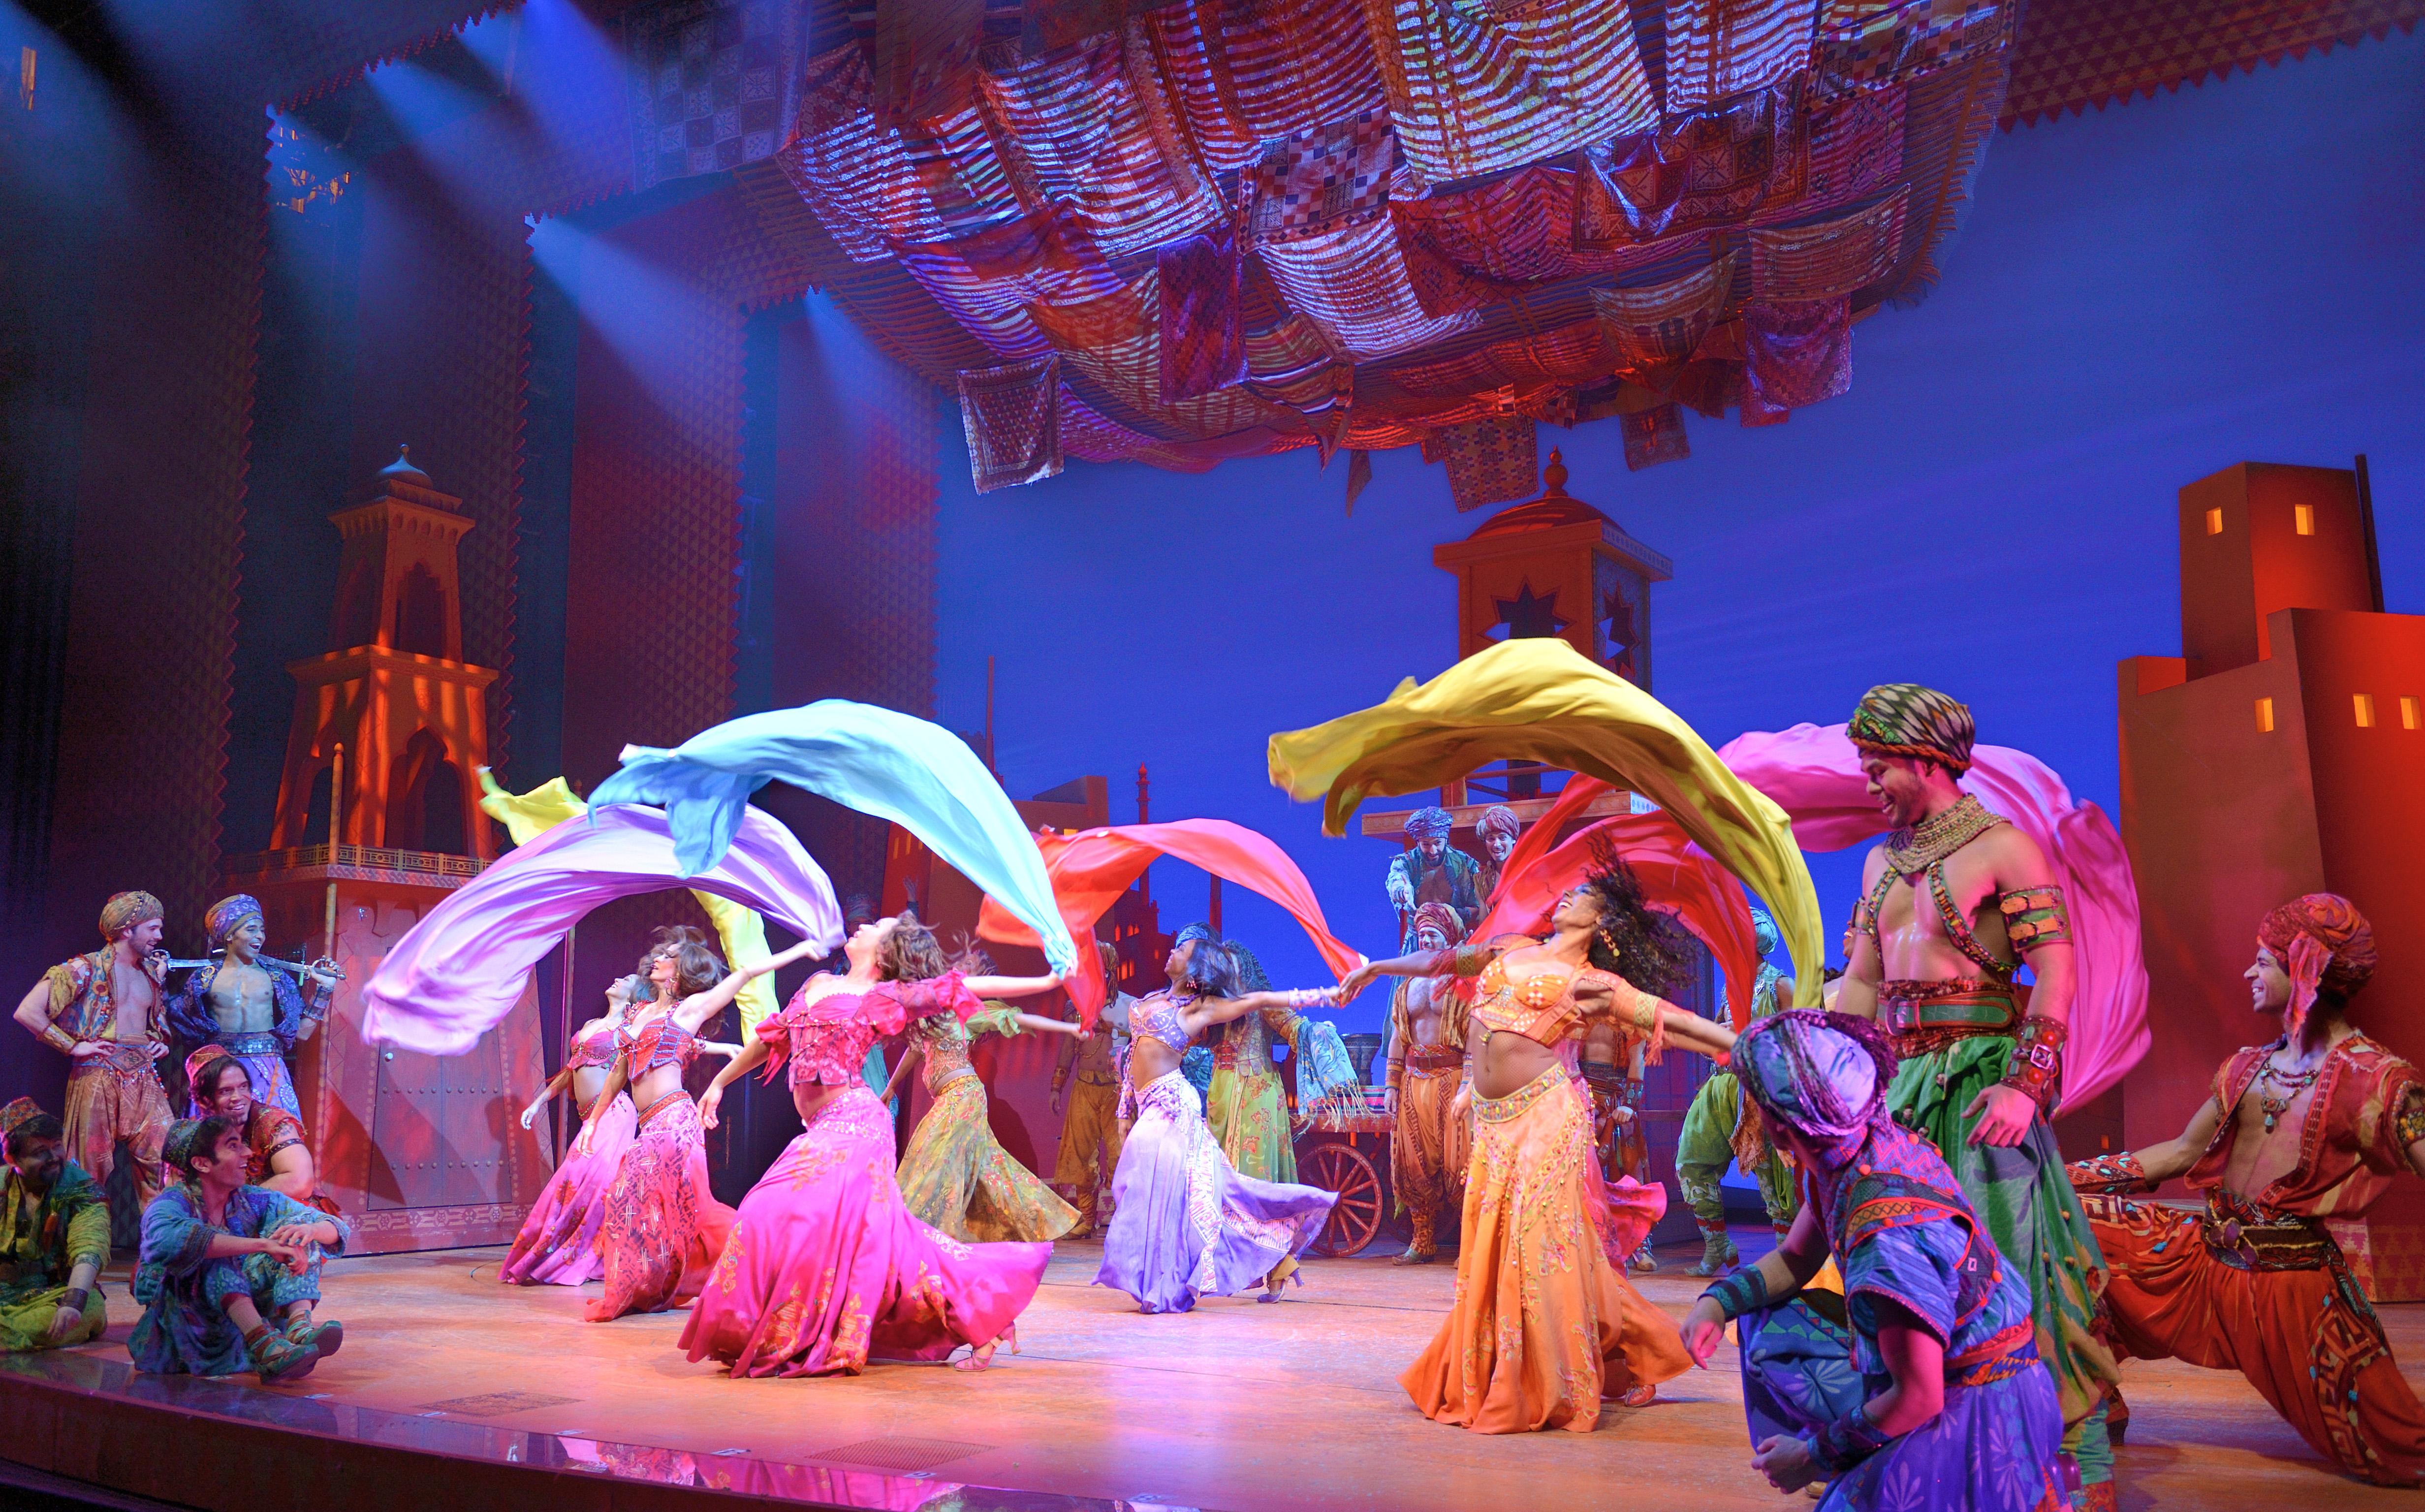 Aladdin - Original Broadway Company